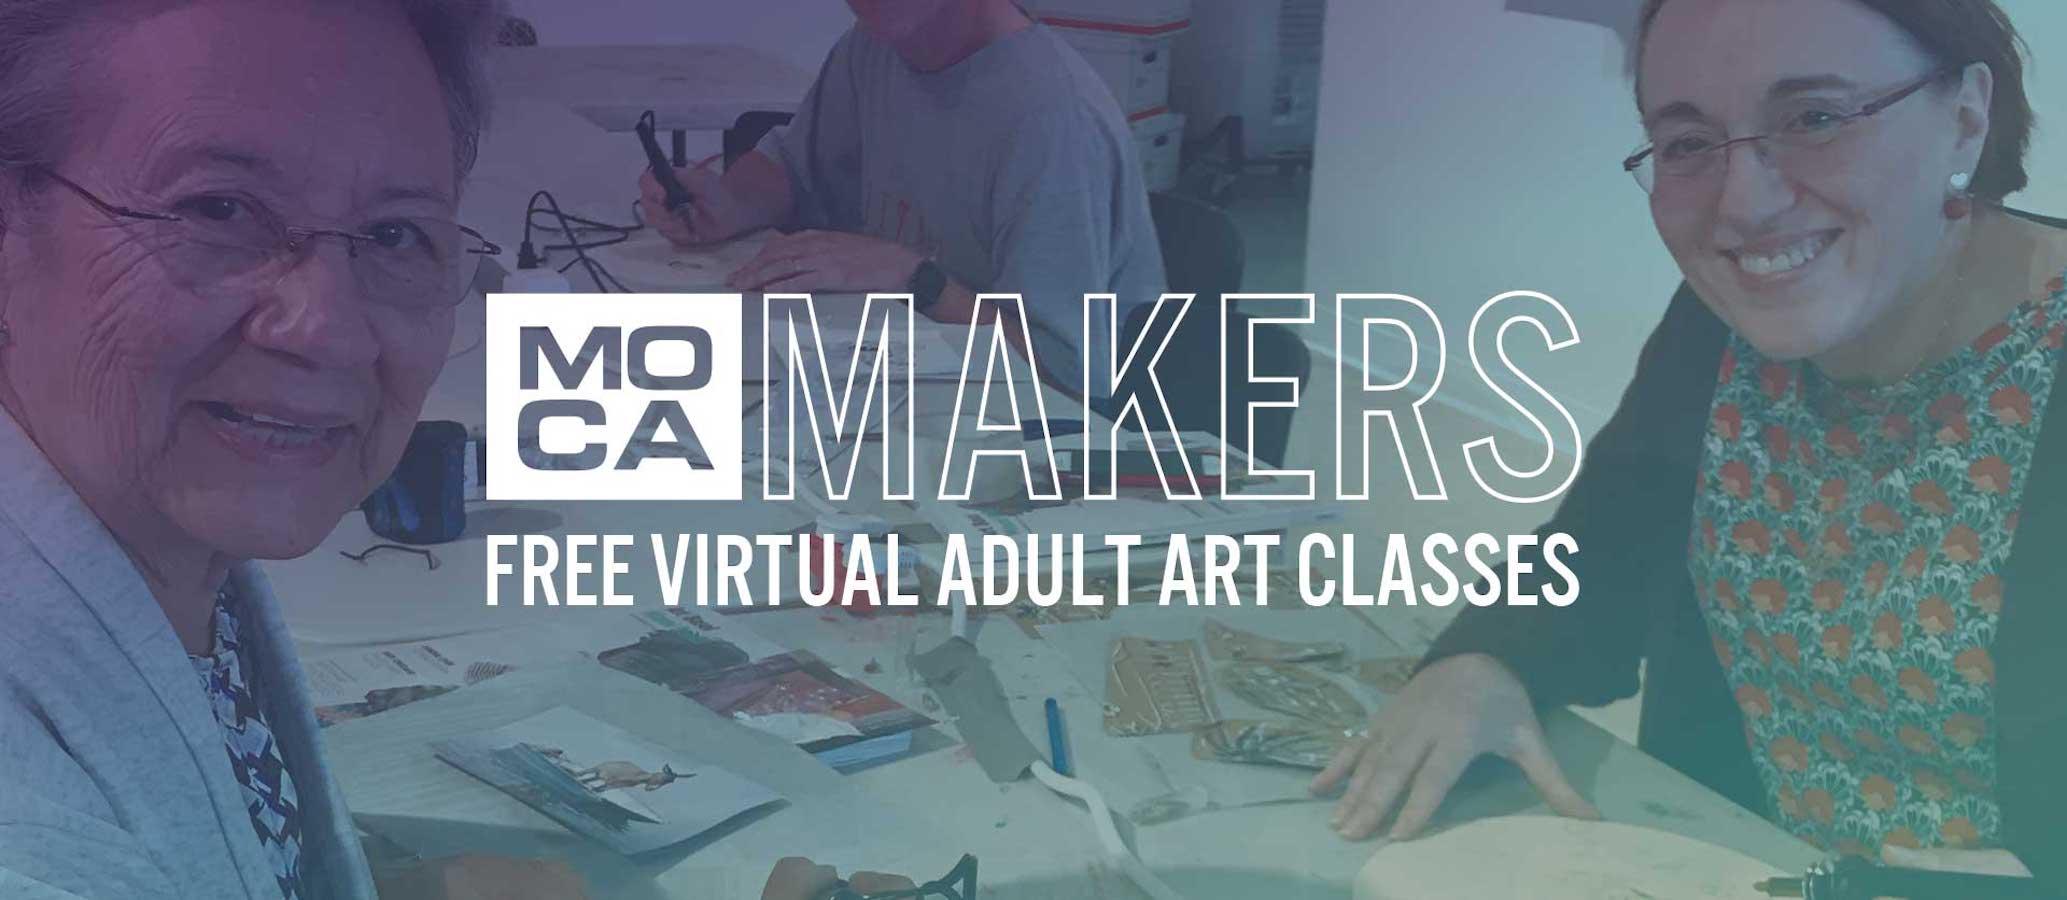 11032020 moca makers web banners 1